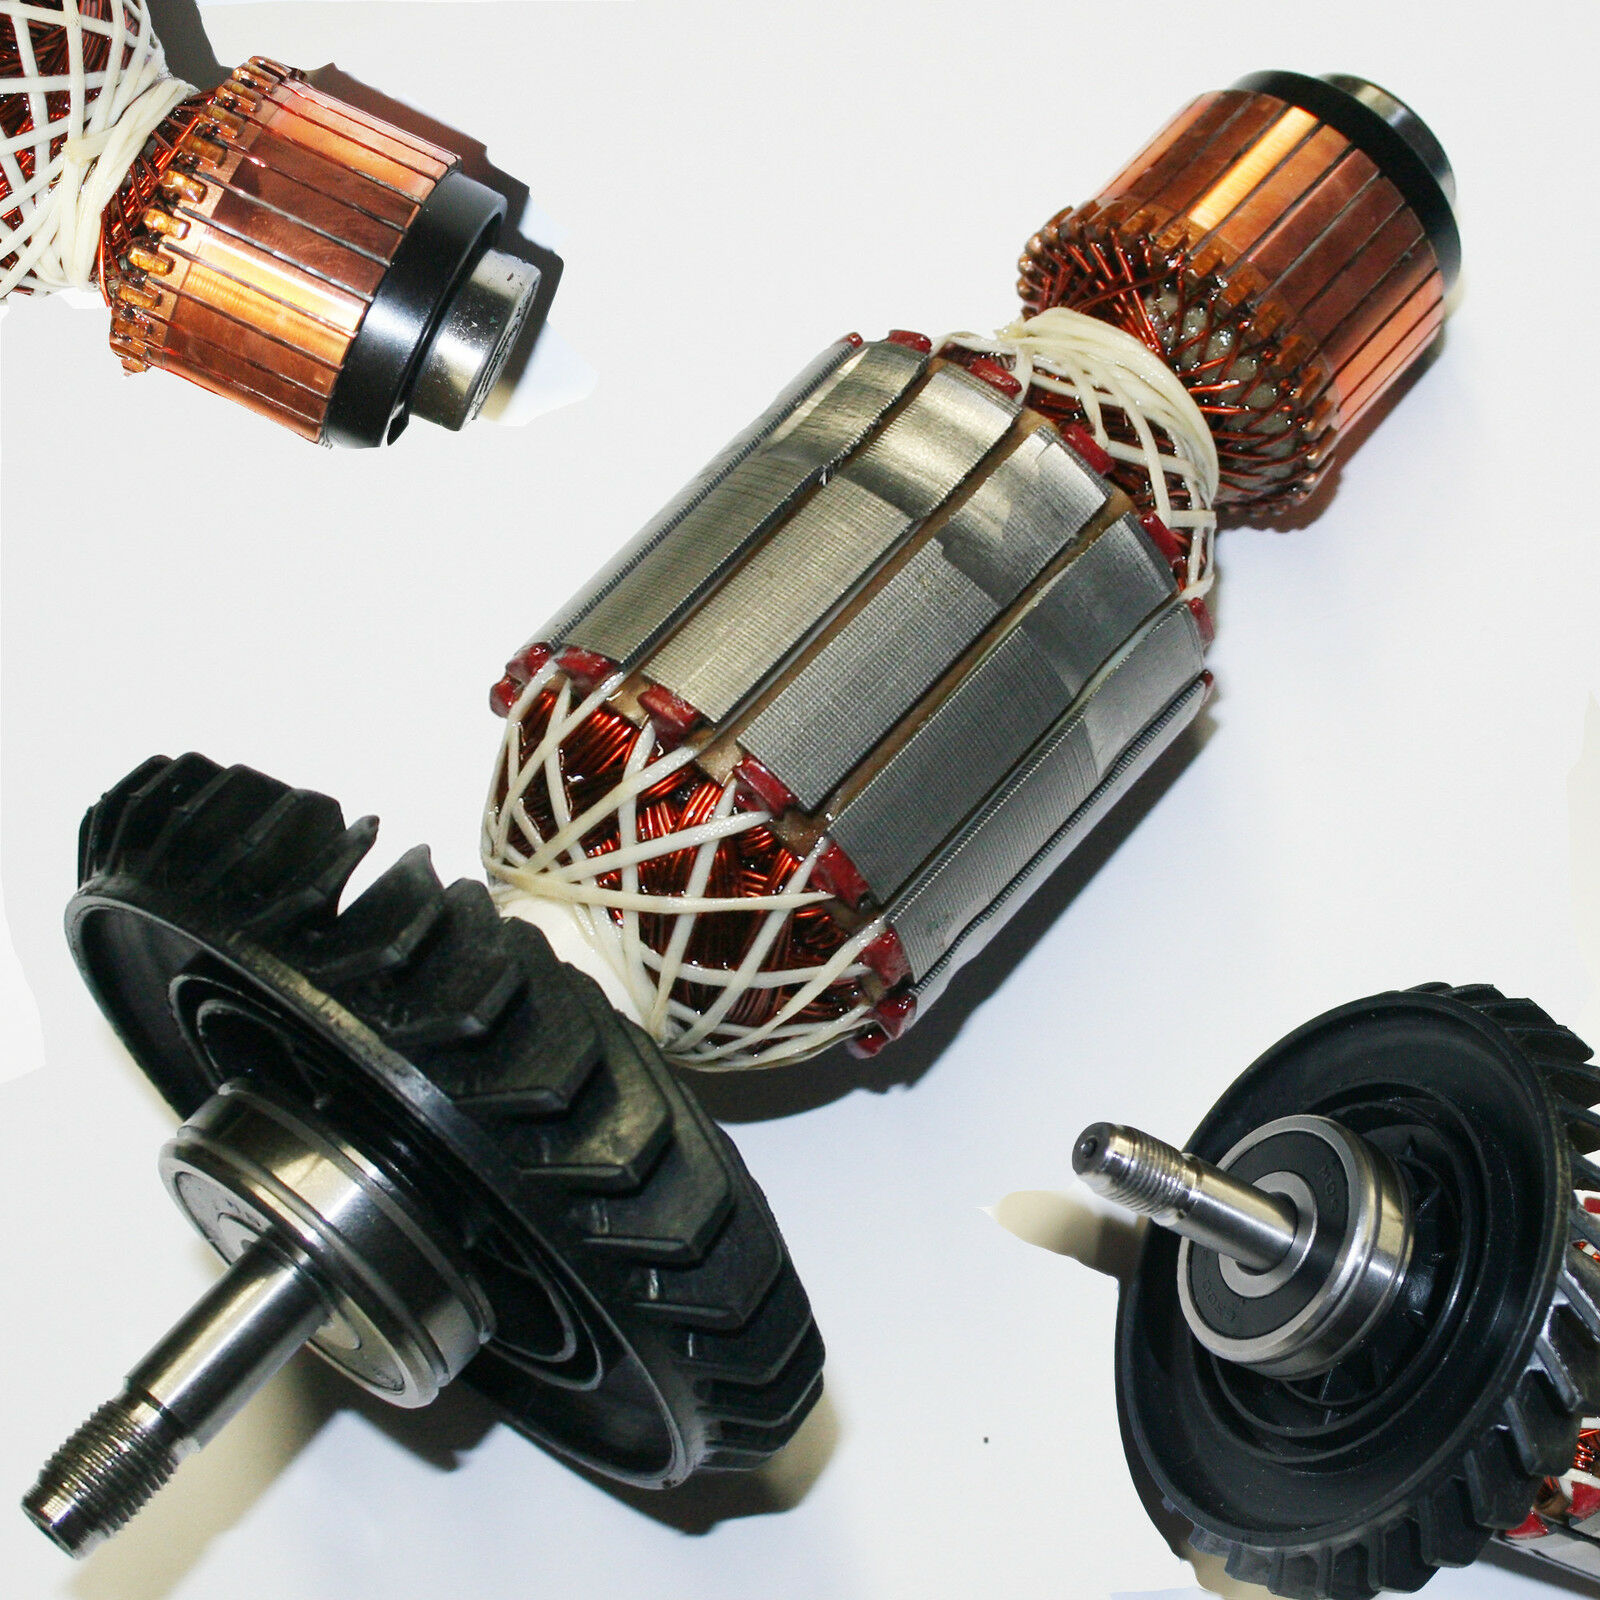 Anker Rotor Läufer für Hilti Winkelschleifer AG 230-S , Hilti AG 230 S